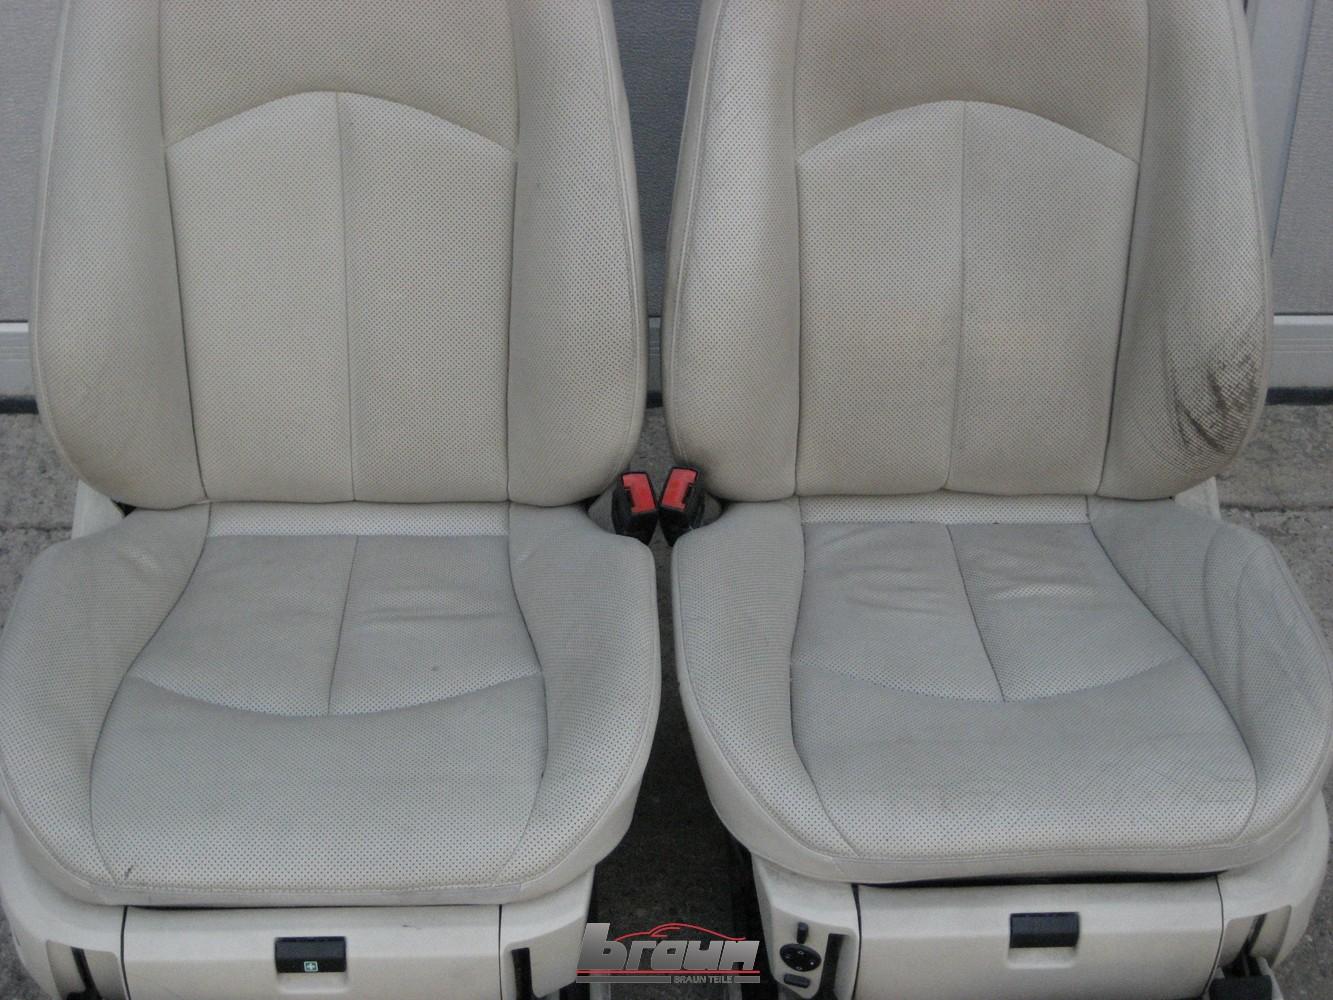 lederausstattung ledersitze kiesel beige mercedes e klasse w211 s211 kombi innenausstattung sitze. Black Bedroom Furniture Sets. Home Design Ideas